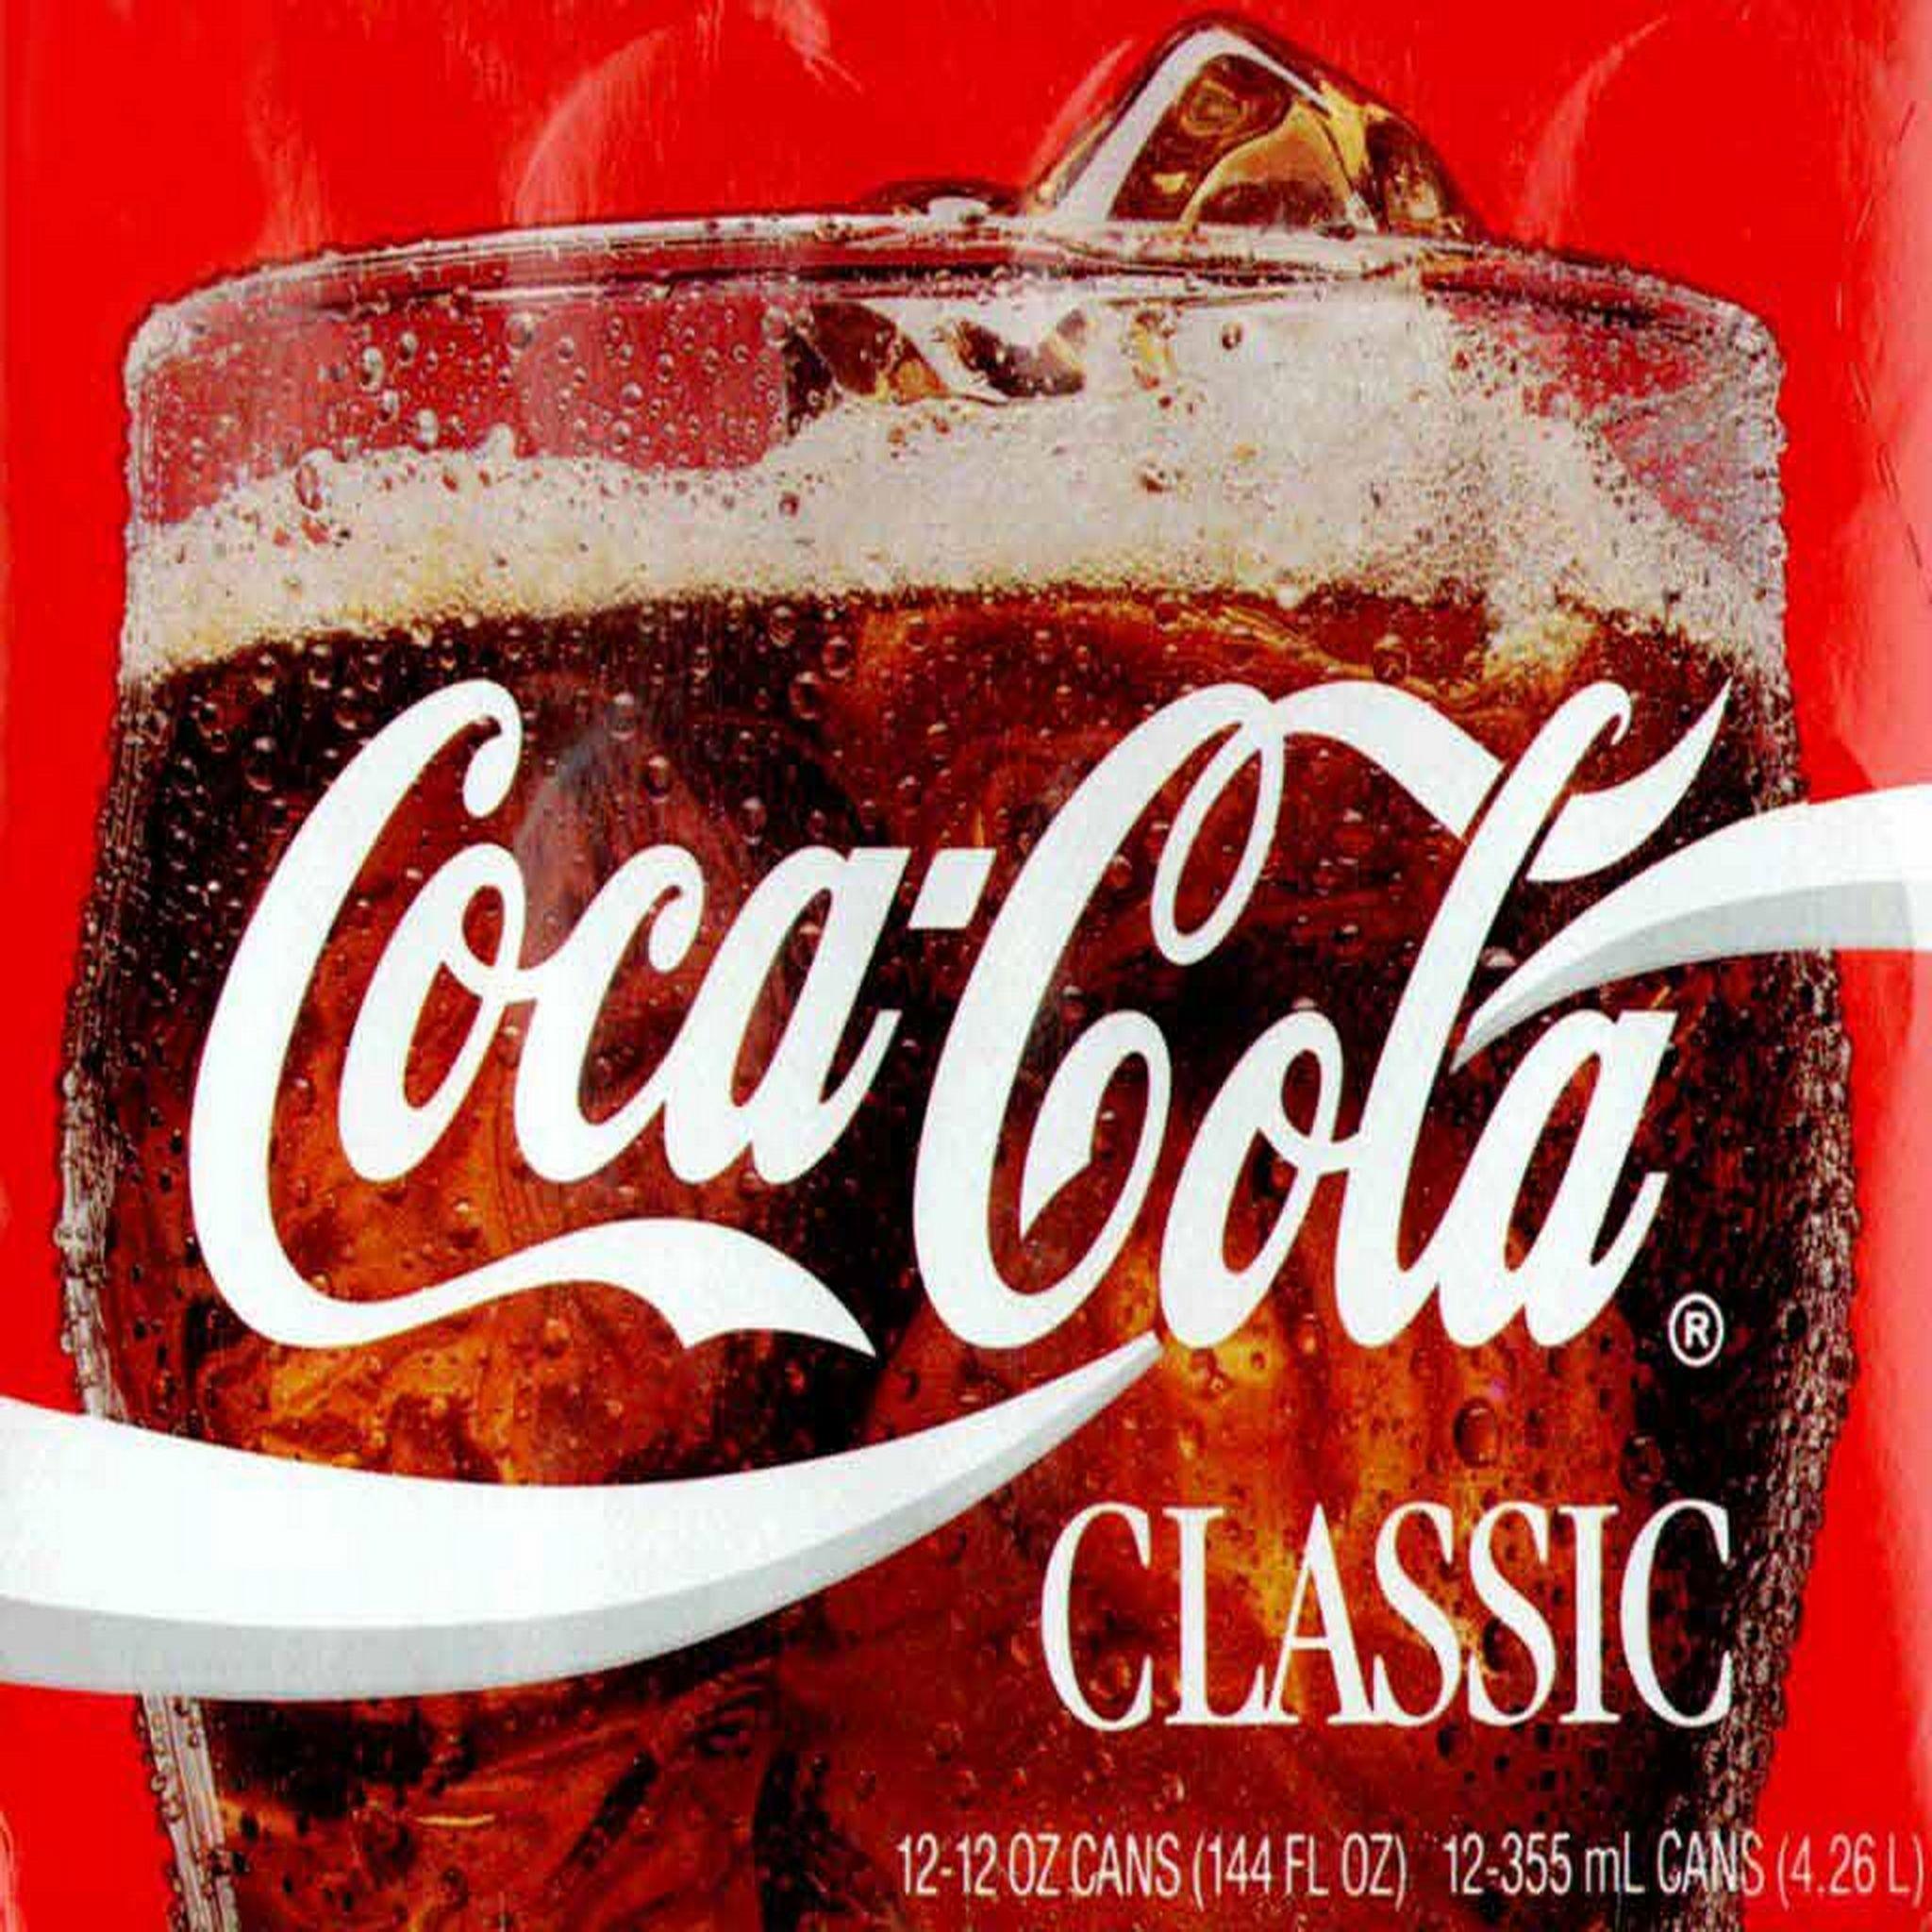 Coca Cola Quotes Classic  Quotes & Posters  Pinterest  Coca Cola And Cola